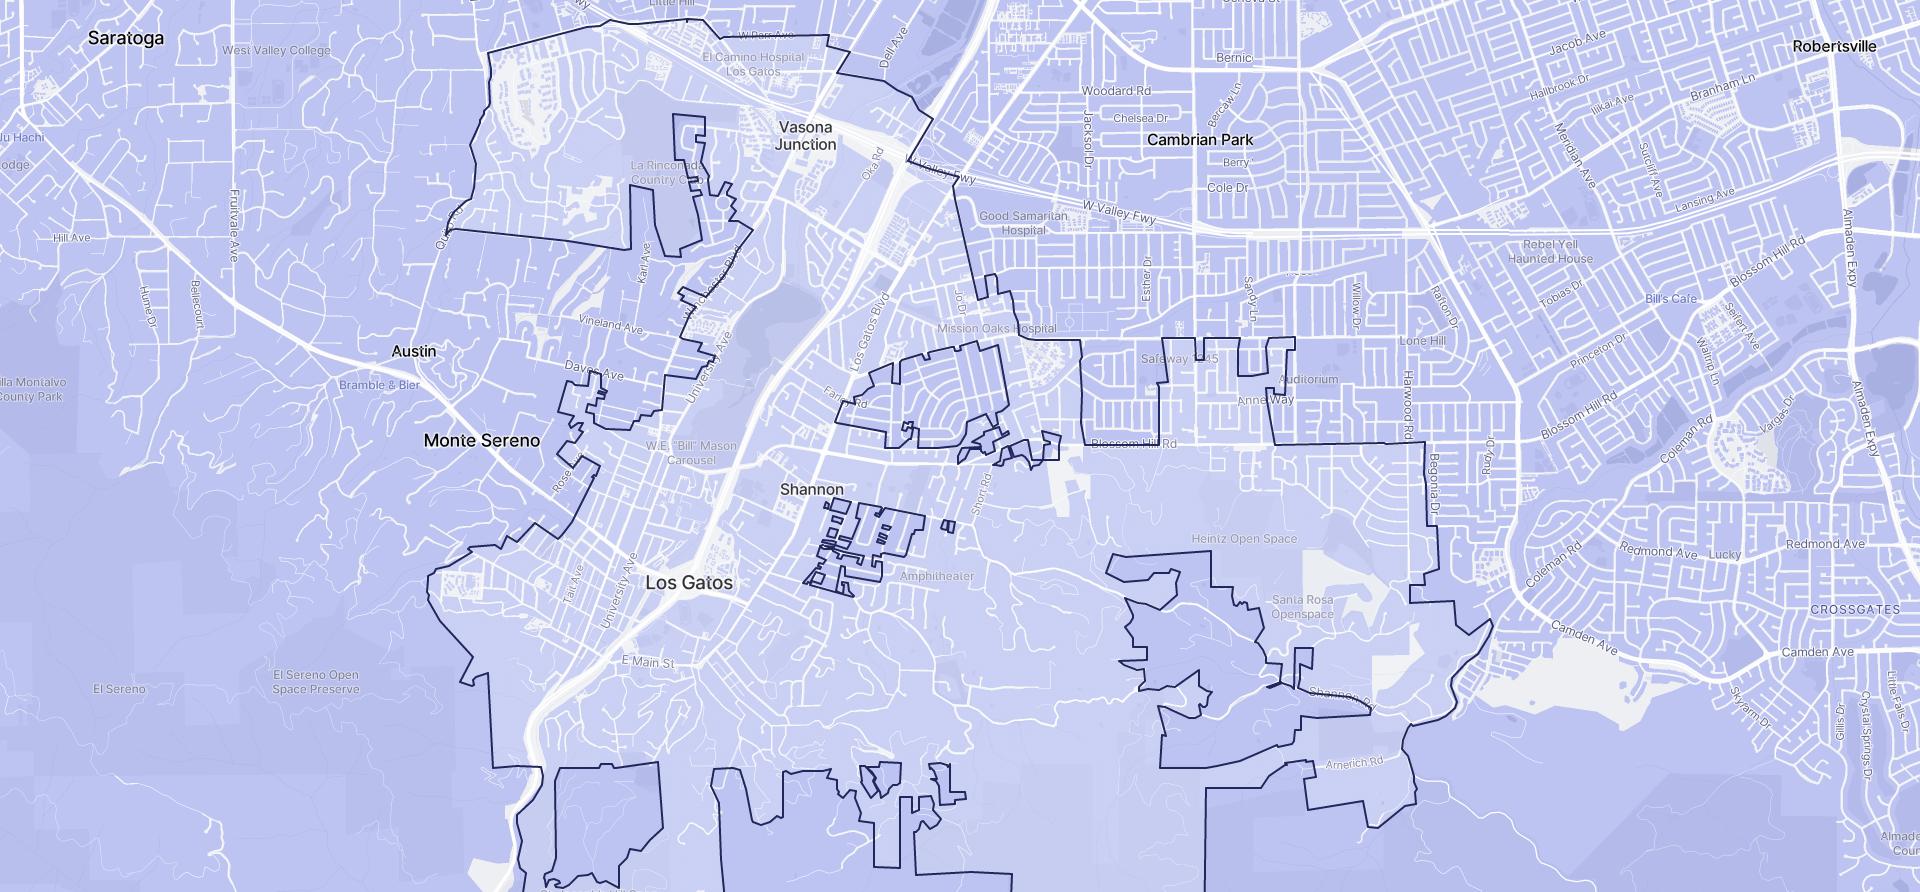 Image of Los Gatos boundaries on a map.